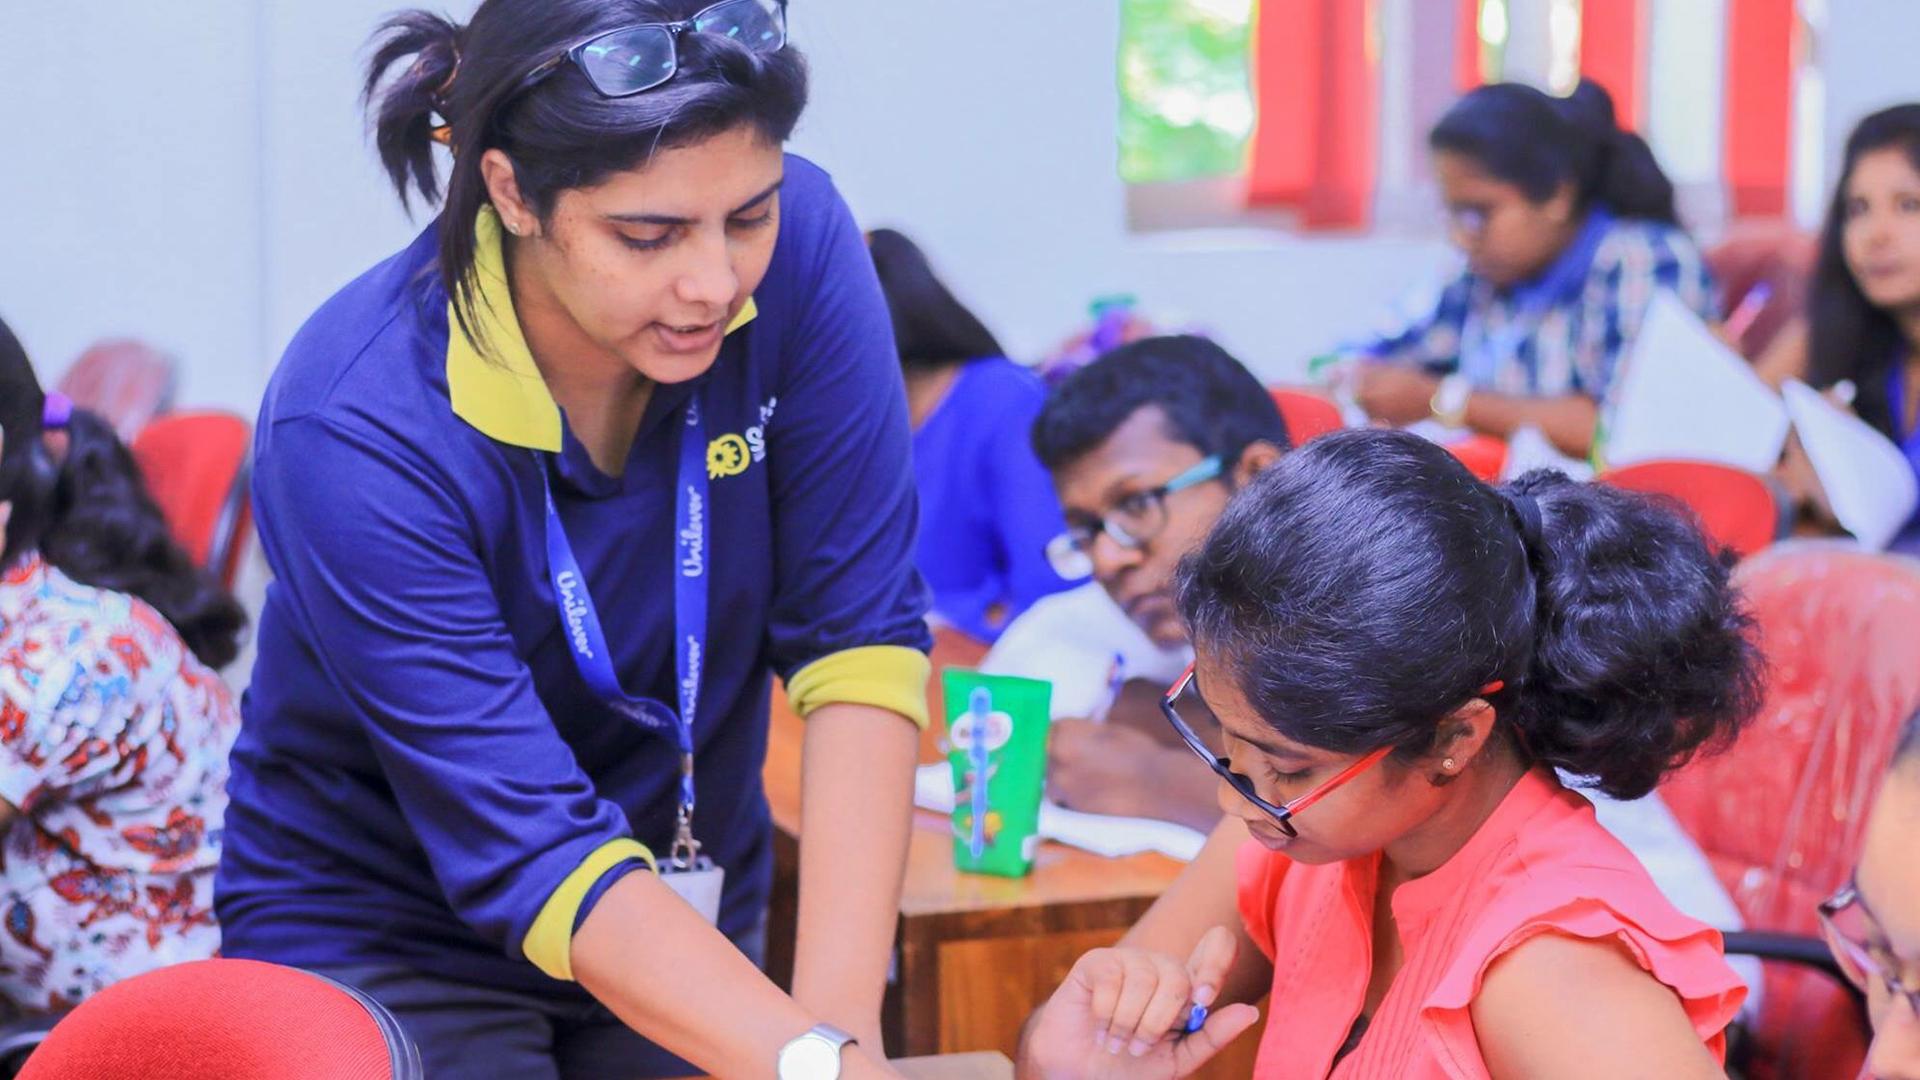 Unilever employee teaching at a school